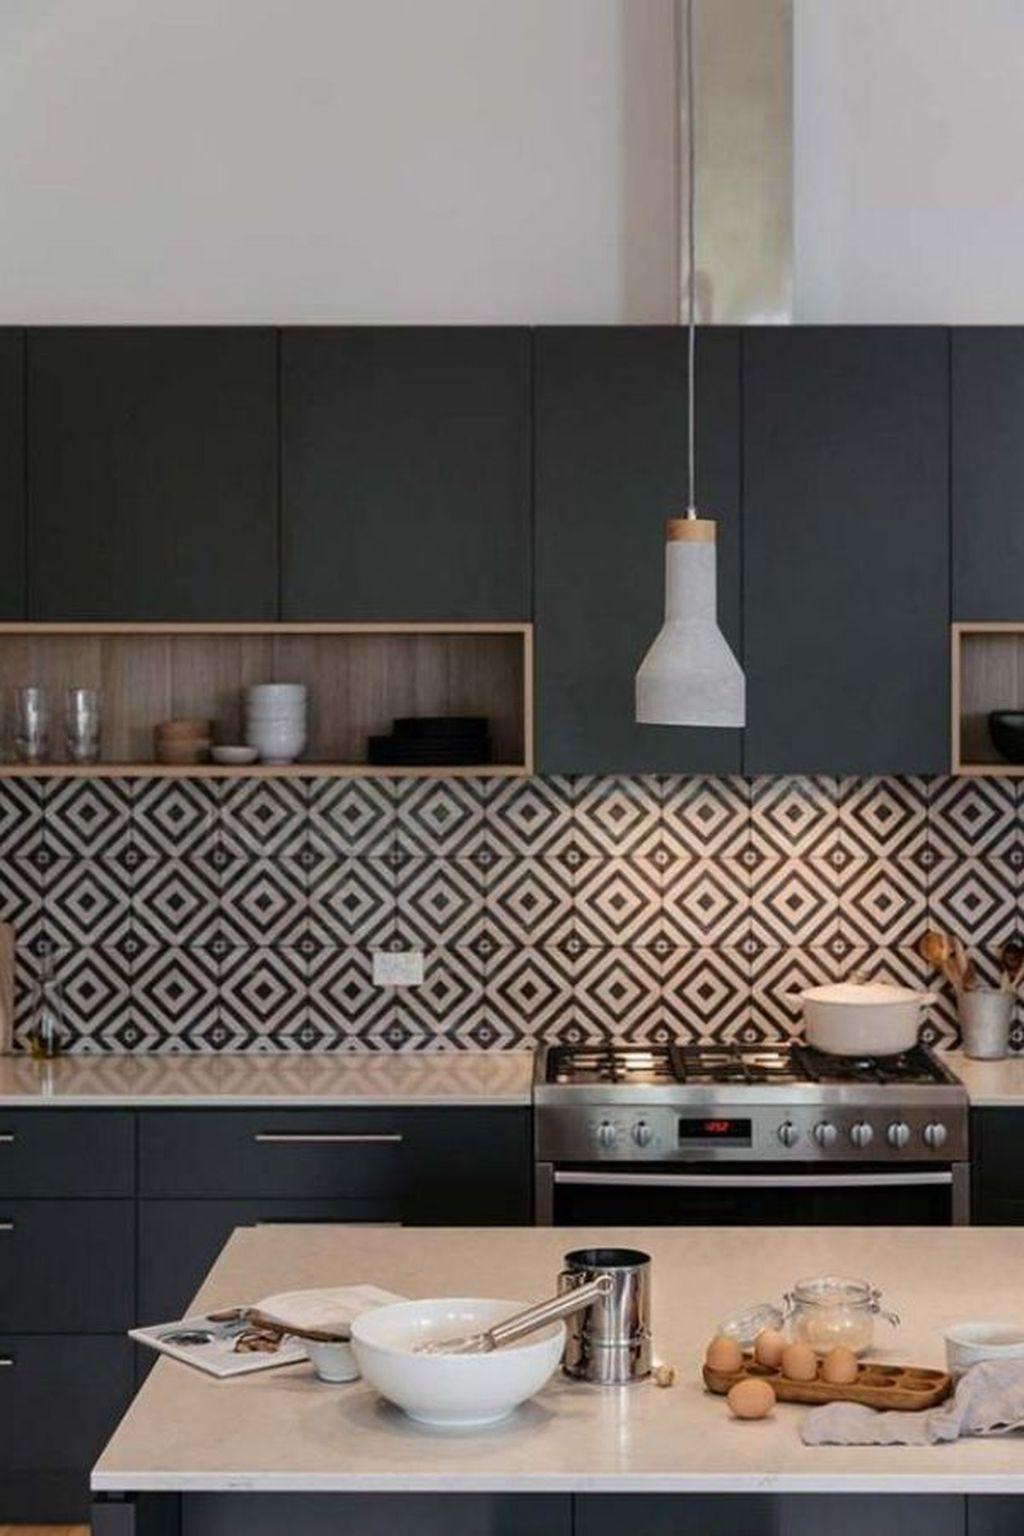 20+ Delicate Black Kitchen Interior Design Ideas For Kitchen To Have Asap